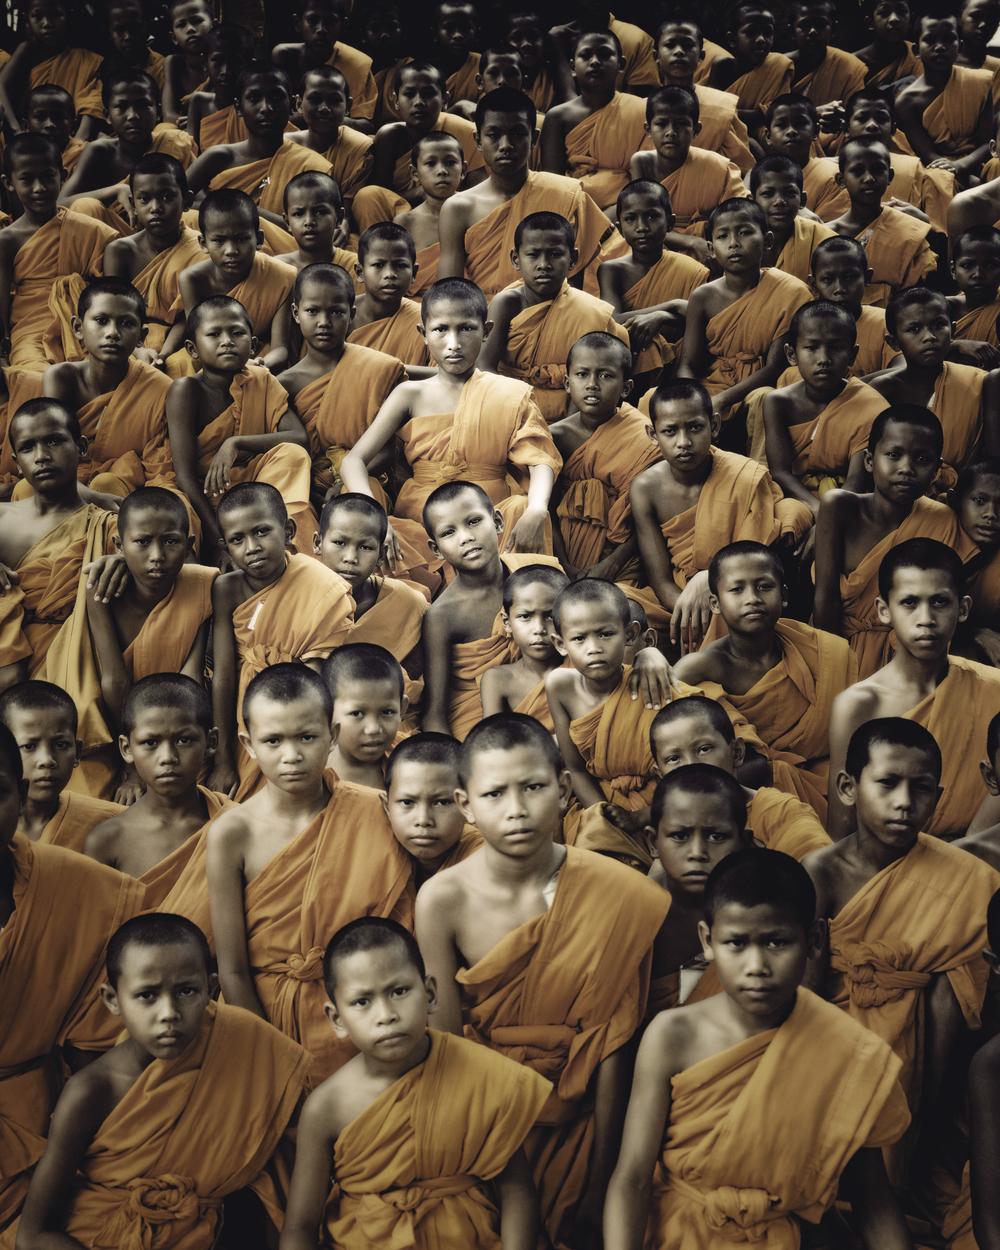 jimmy nelson // xix 330 buddhist monks ganden monastery tibet, 2011